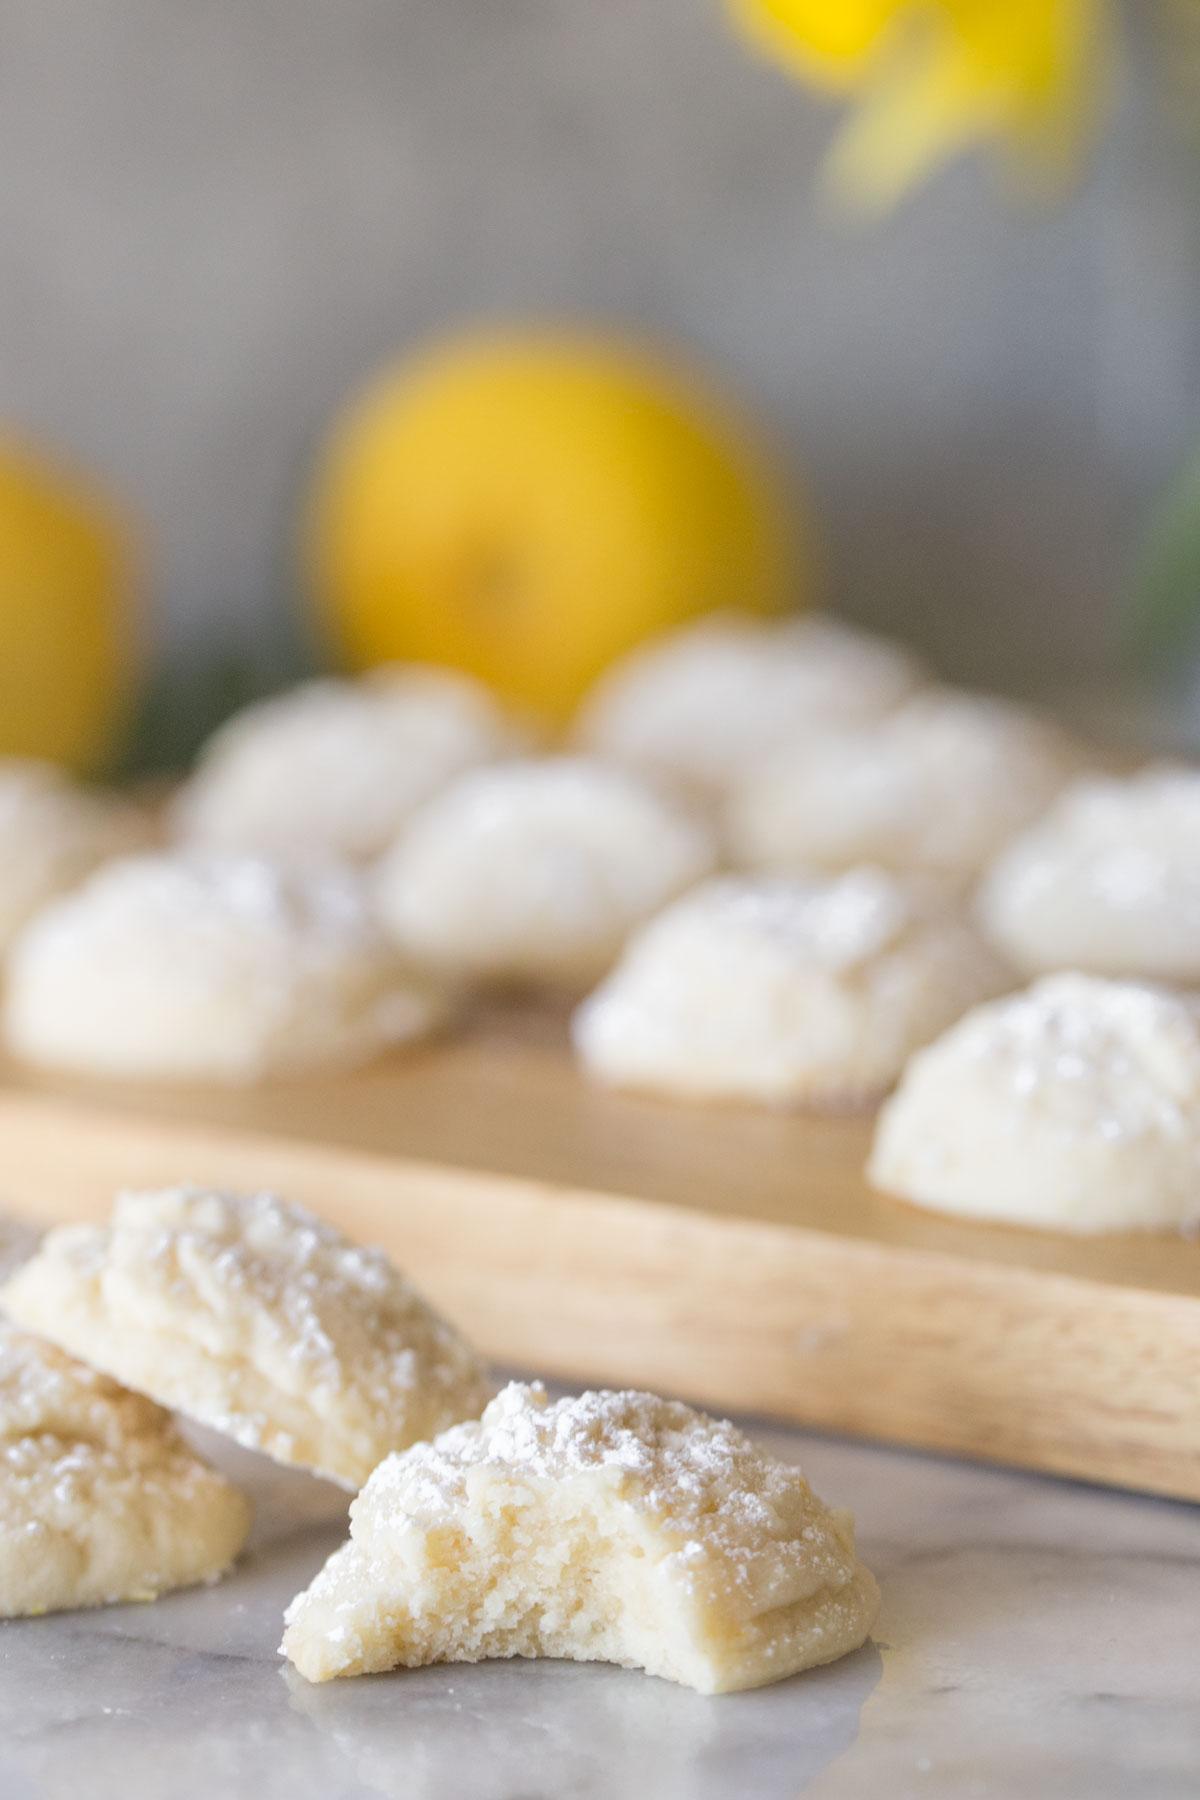 Close up shot of inside texture of Lemon Cookies.